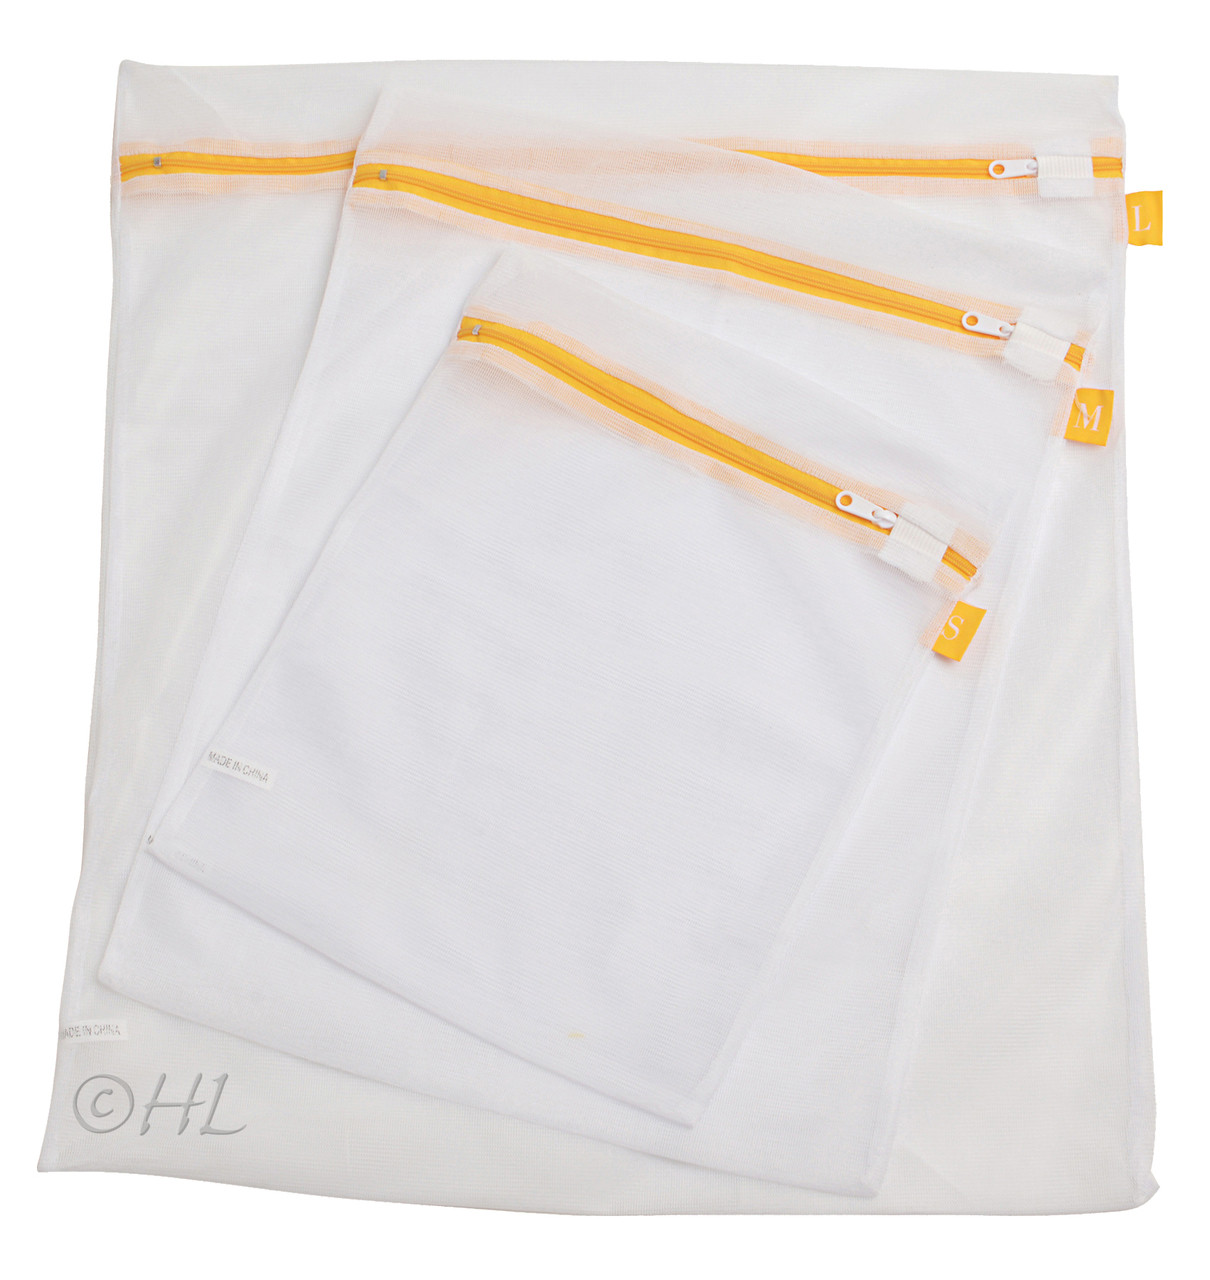 d09c286e546ff Mesh Washing Bag